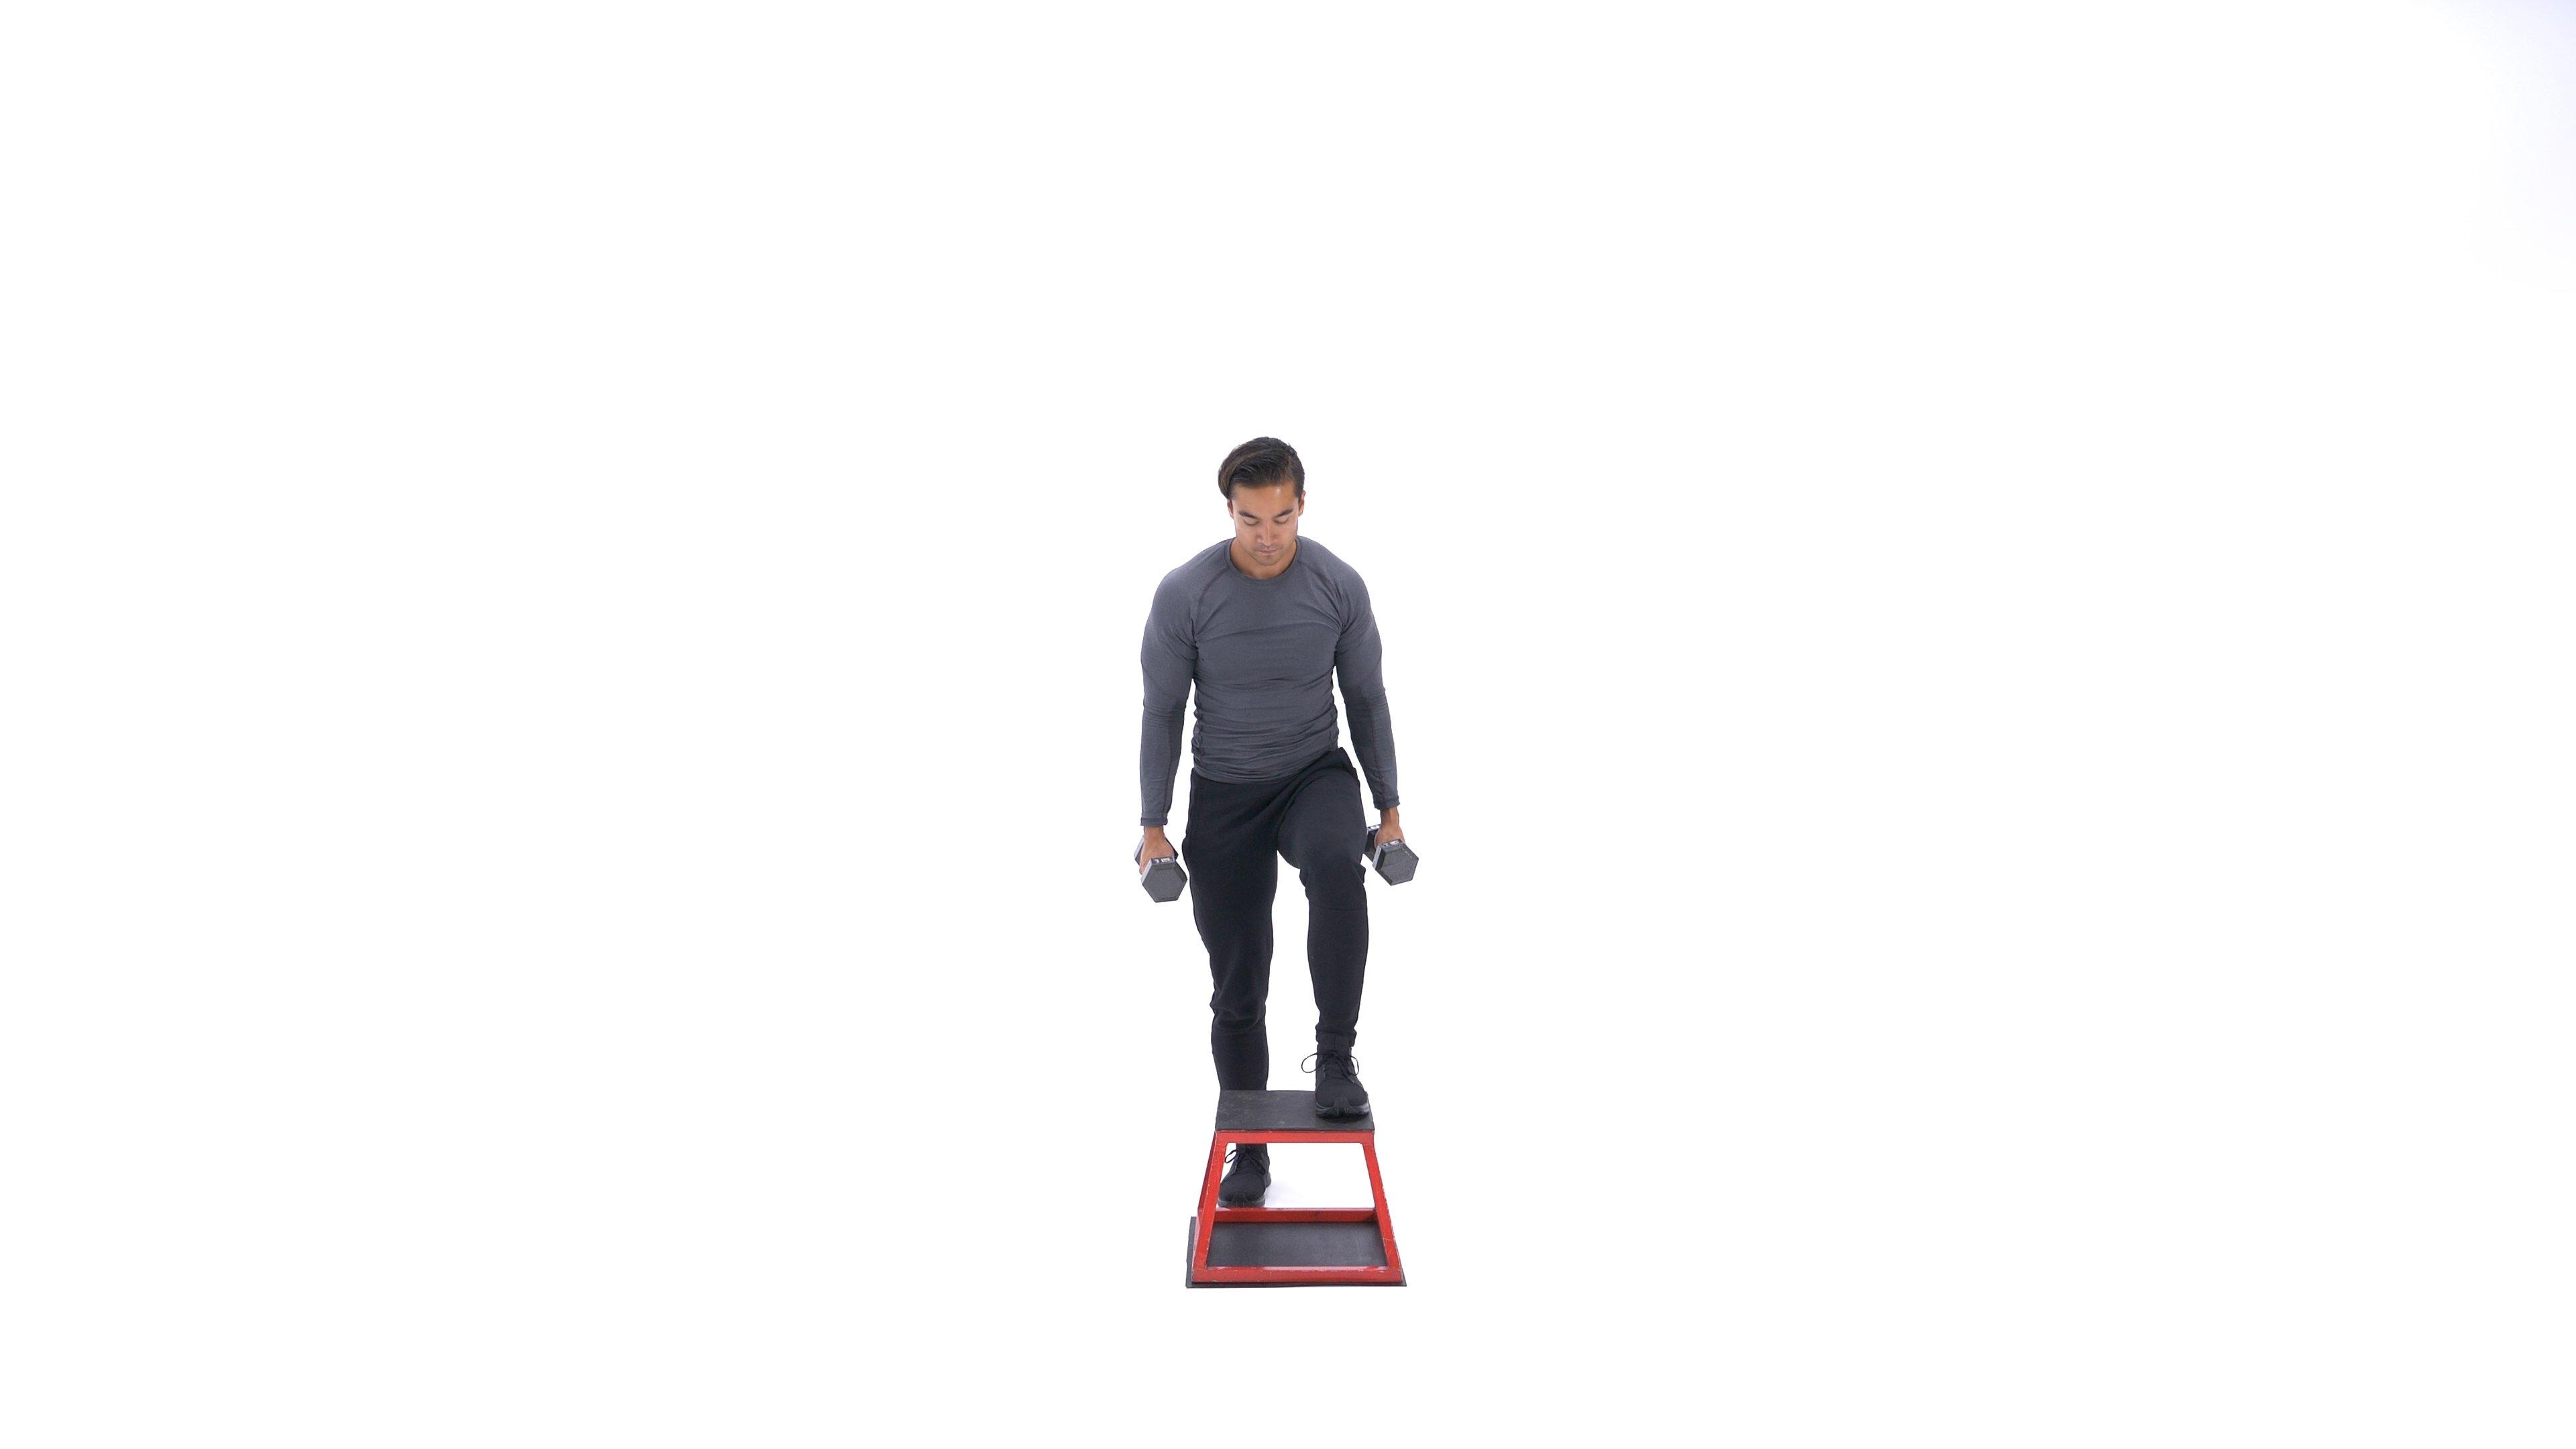 Dumbbell step-up image